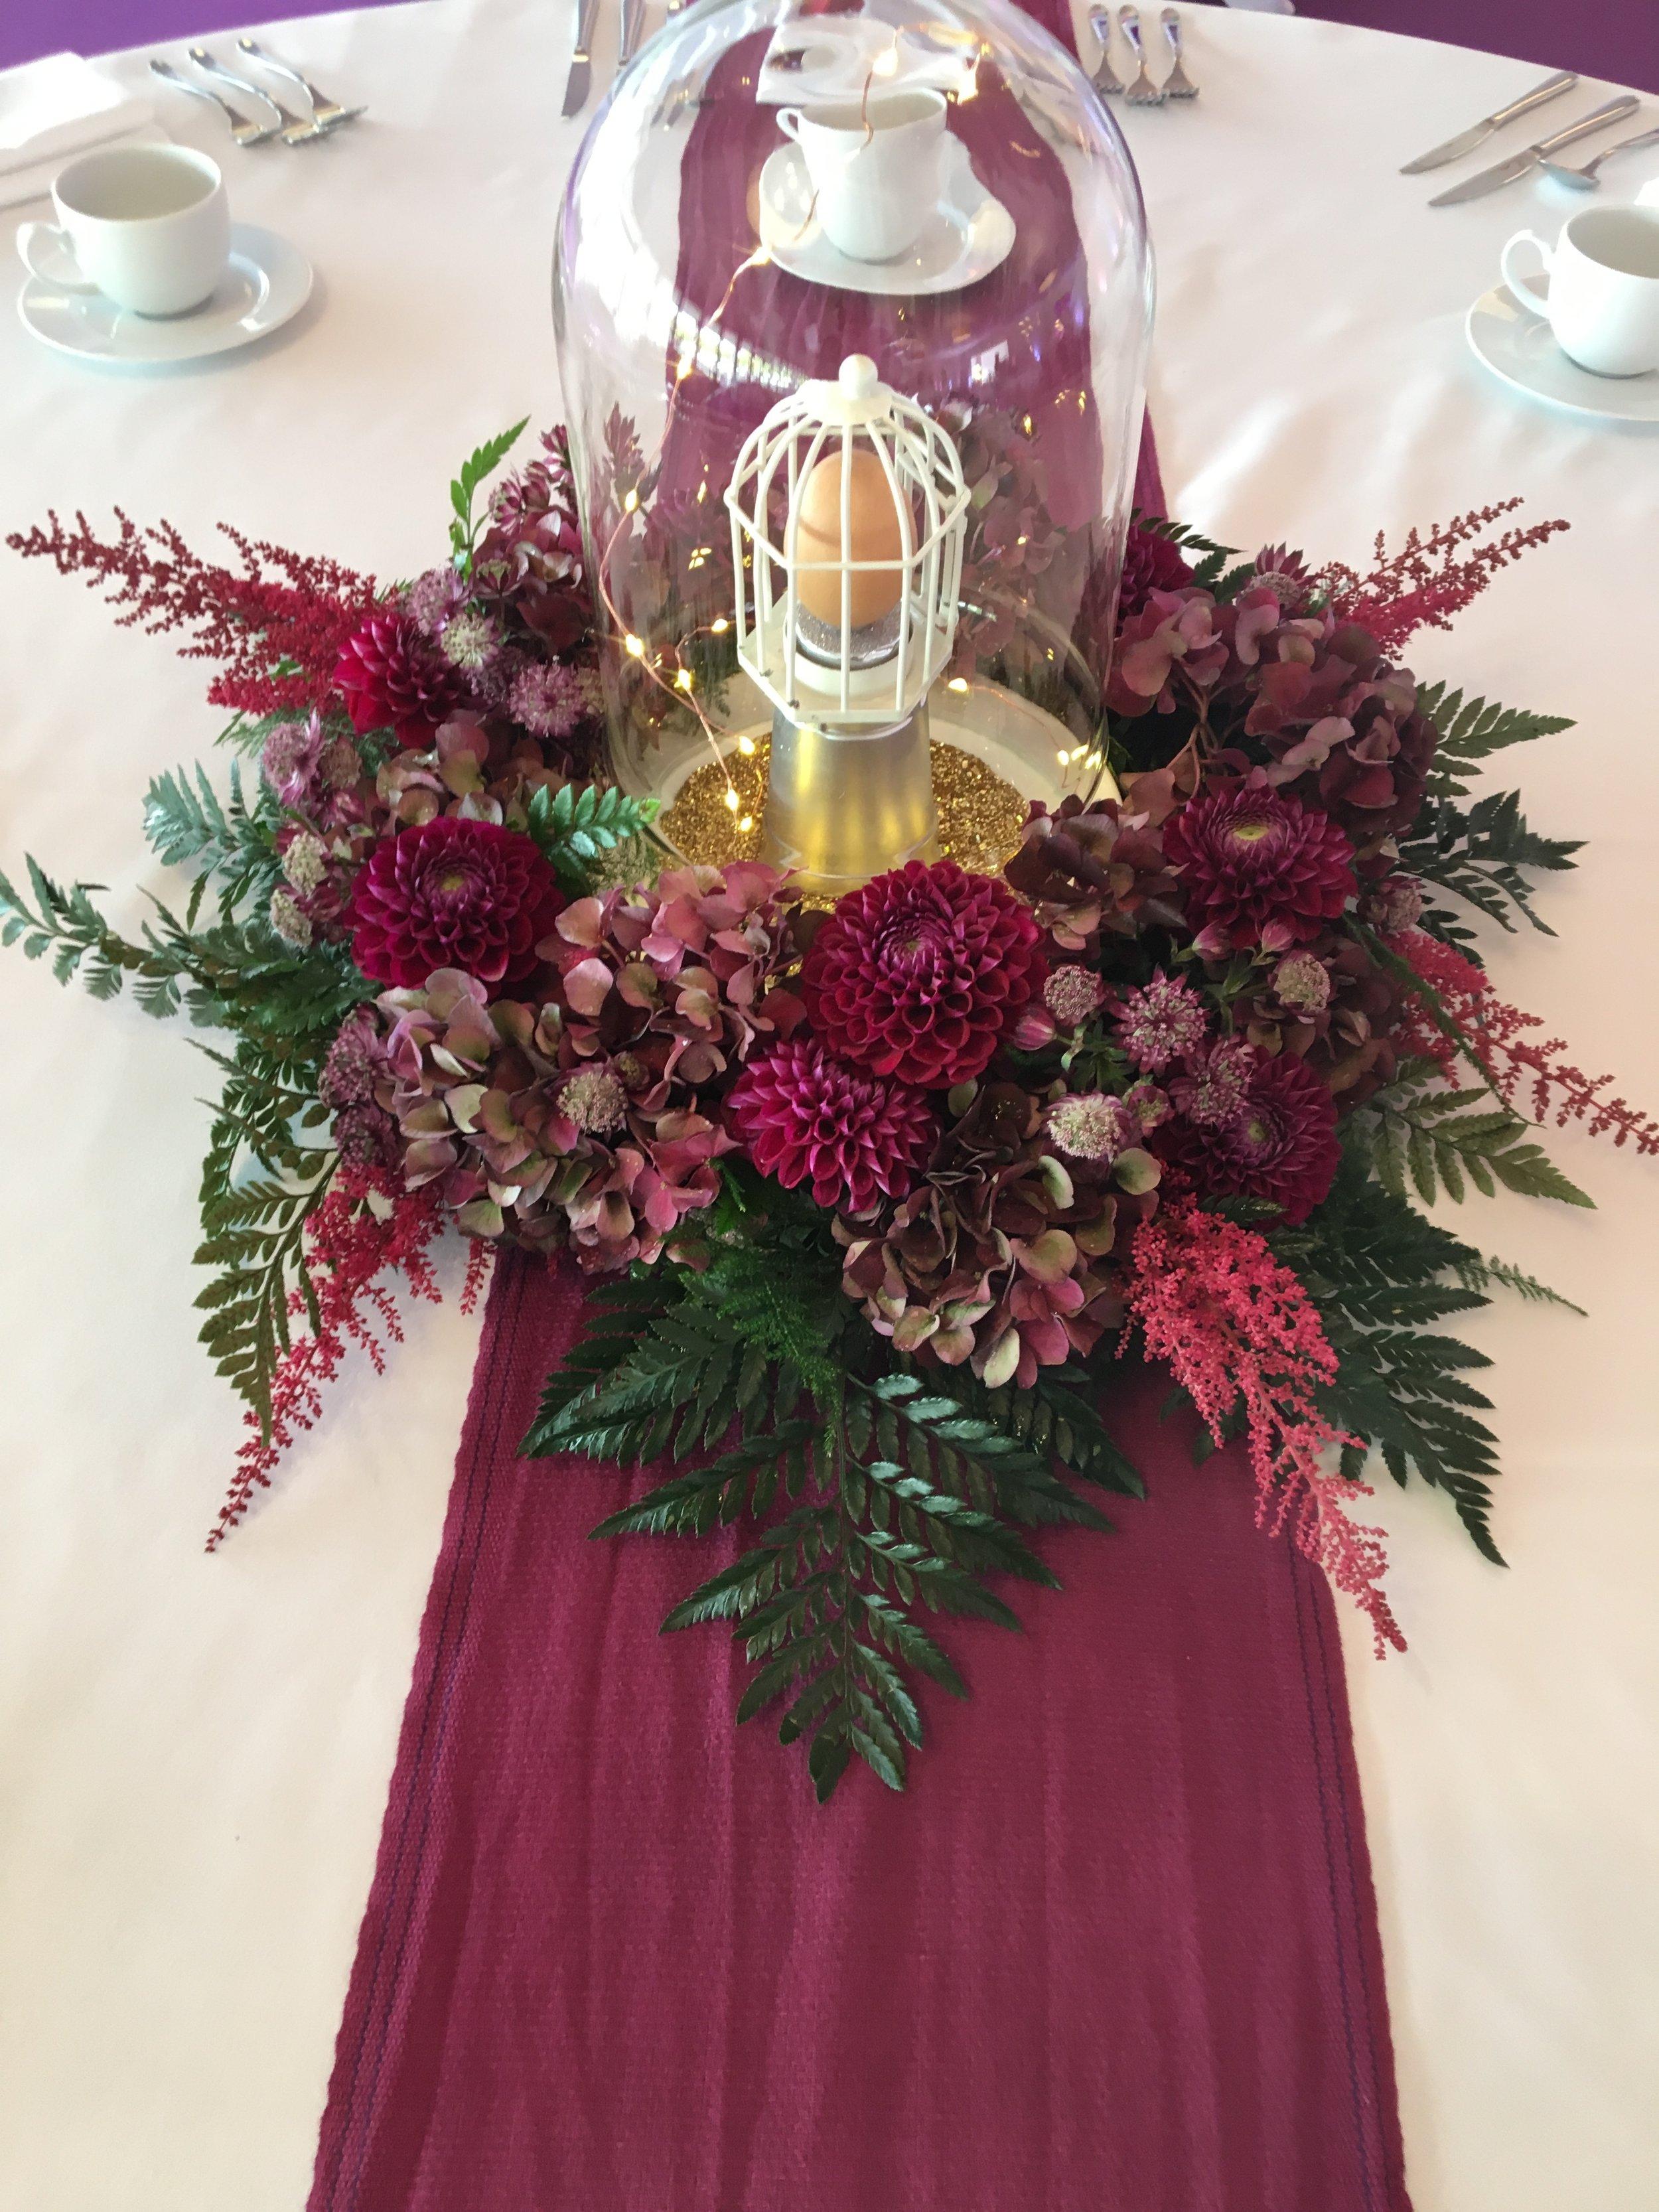 Plum arrangement and bell jar Theatre Of Flowers.JPG